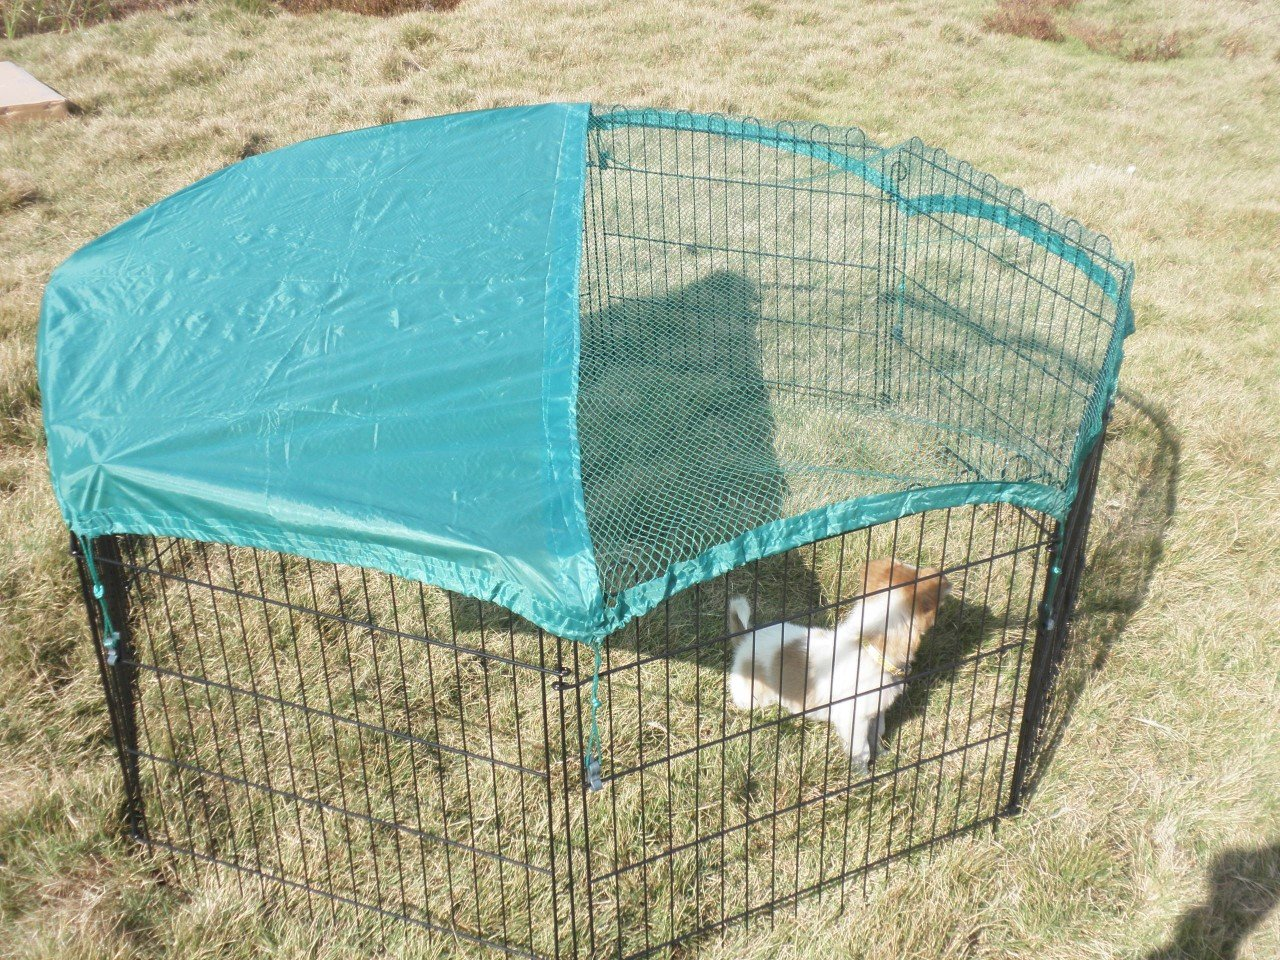 (VivaPet) Large RABBIT CAGE, DUCK GUINEA DOG PLAYPEN PEN ENCLOSURE RUN, With Safety Net, Silver Galvanized